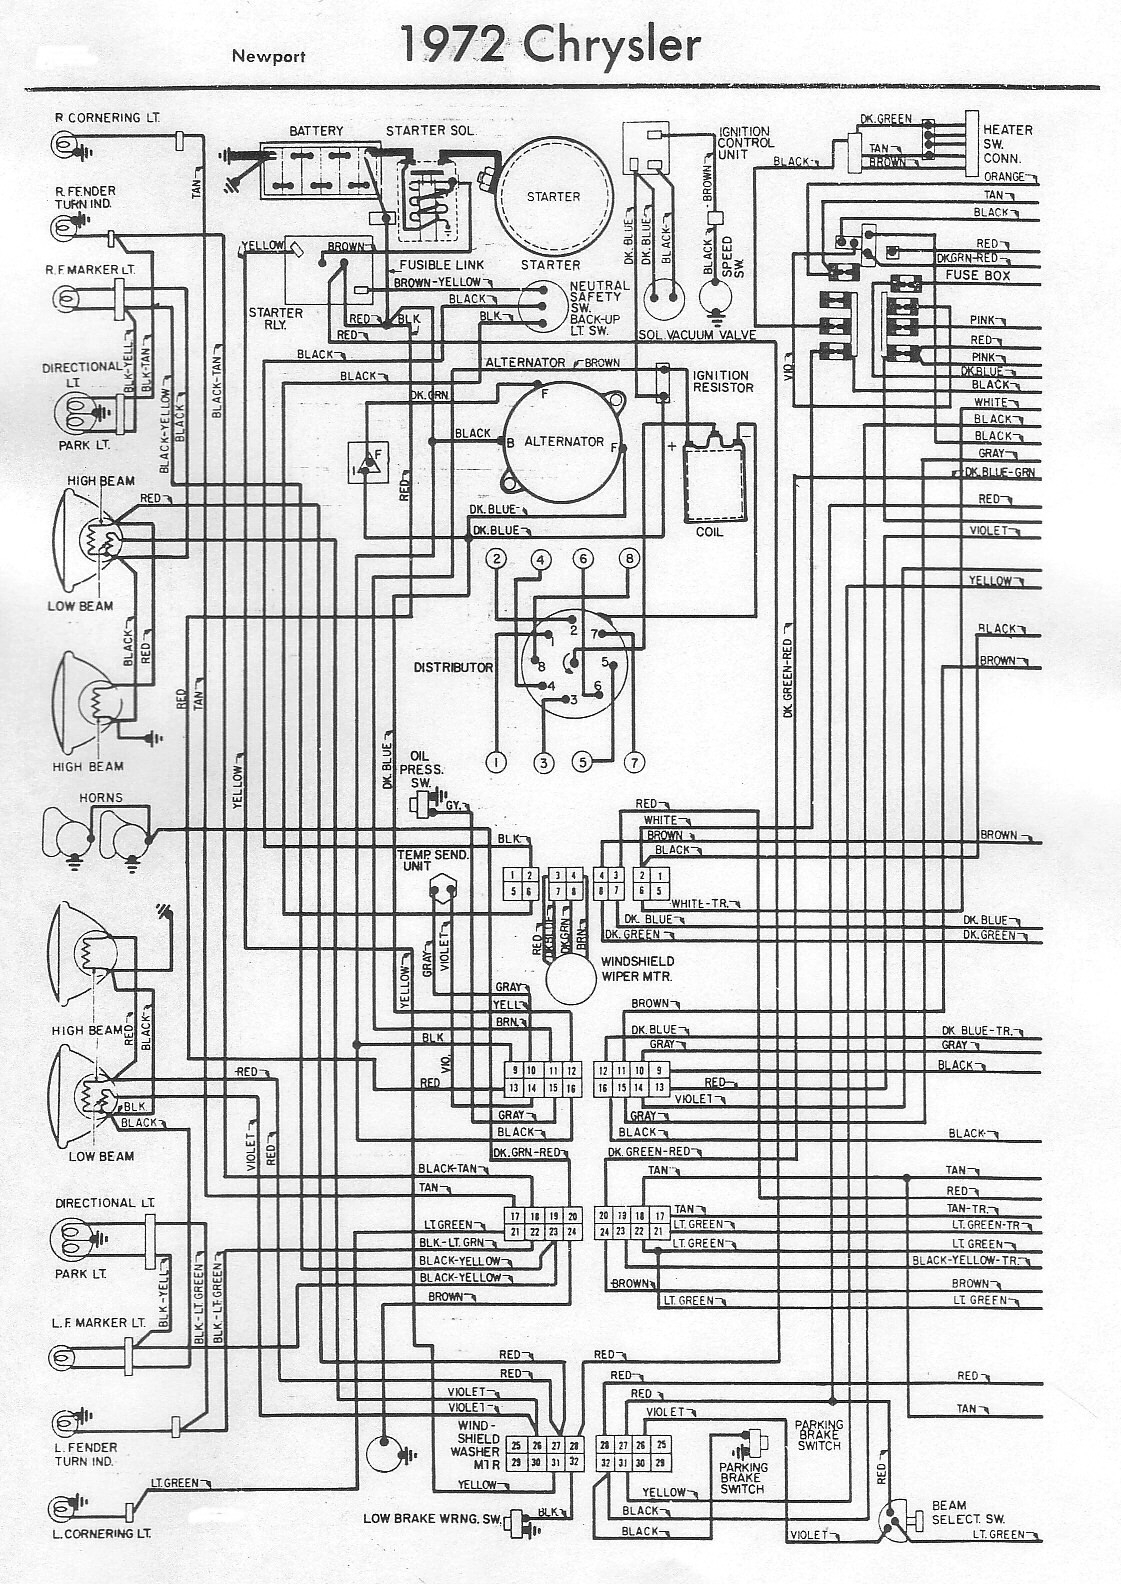 Leyland Roadrunner Wiring Diagram Simple Electronic Circuits 1969 Exelent Crest Electrical Circuit Rh Suaiphone Org Road Runner Anatomy Bird